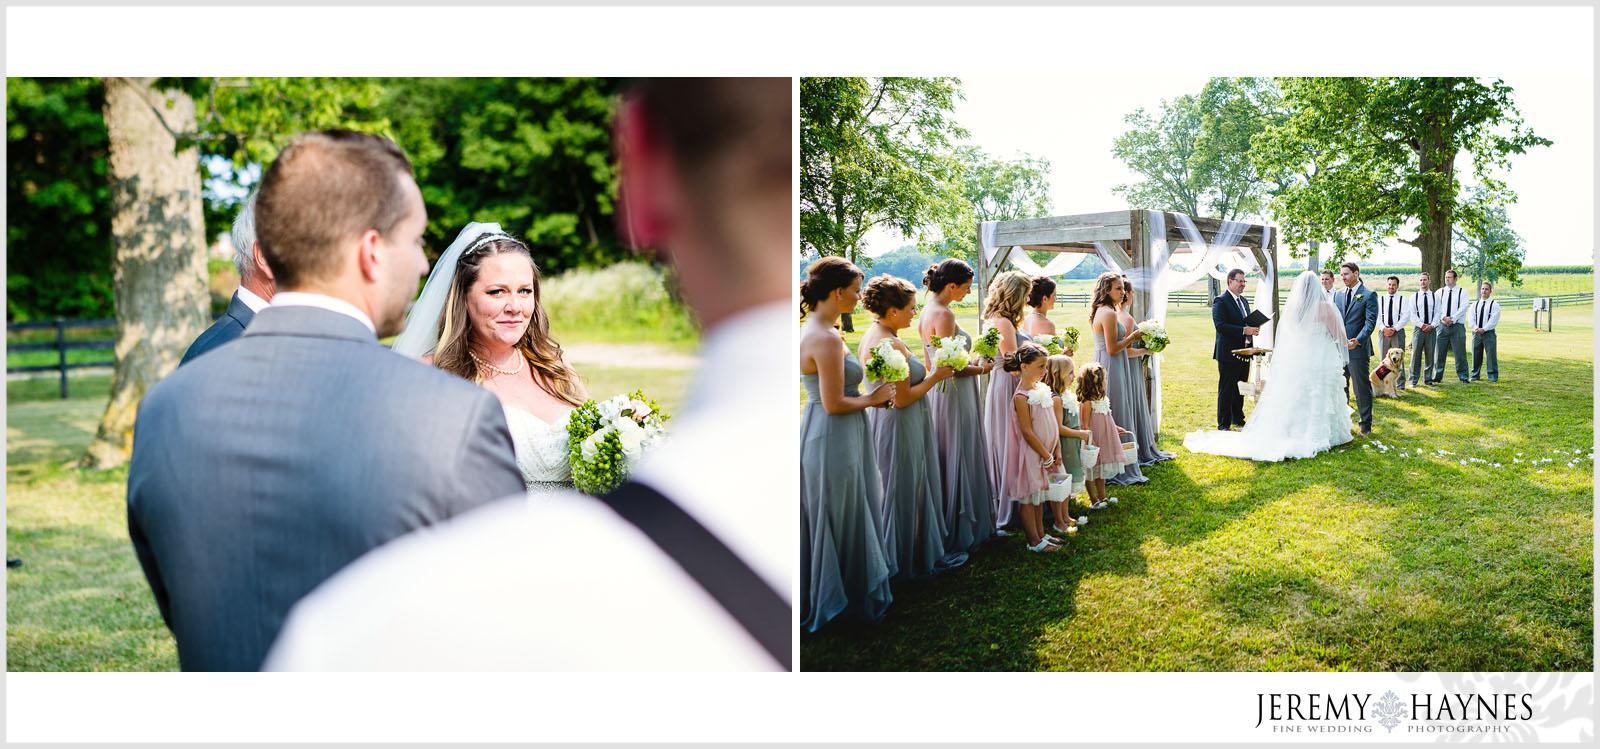 22-diamonds-and-dust-venue-logansport-wedding-photography-ceremony-photos.jpg